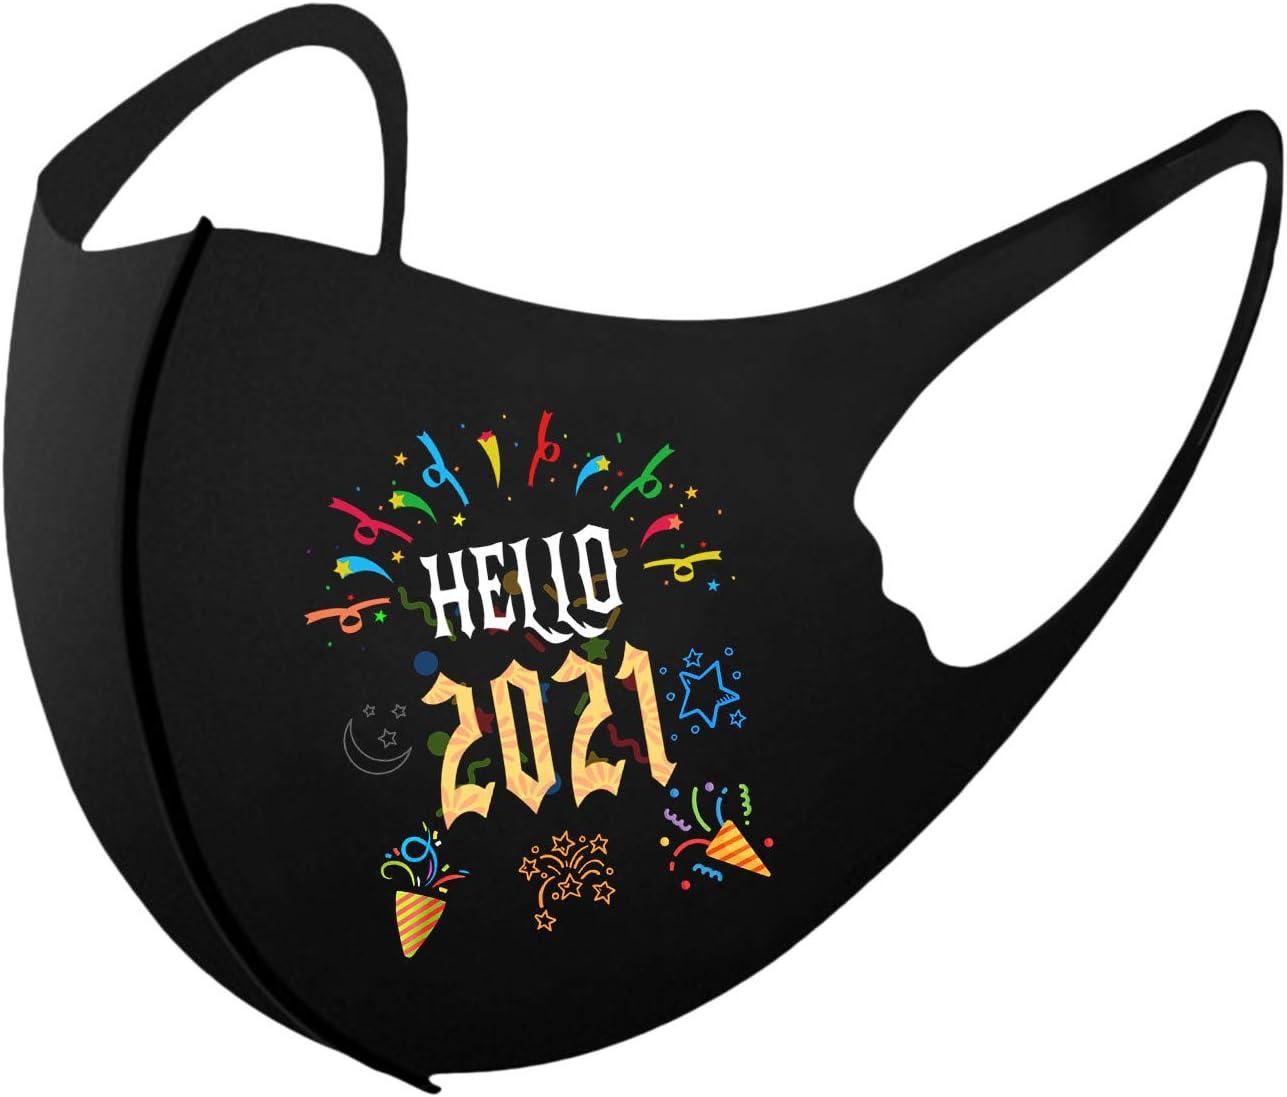 BEUU 1PCS Black Cloth Face Bandana for Kids,2021 Happy New Year Printed Face Balacava,Washable & Reusable,Bandanas for Outdoor Activities